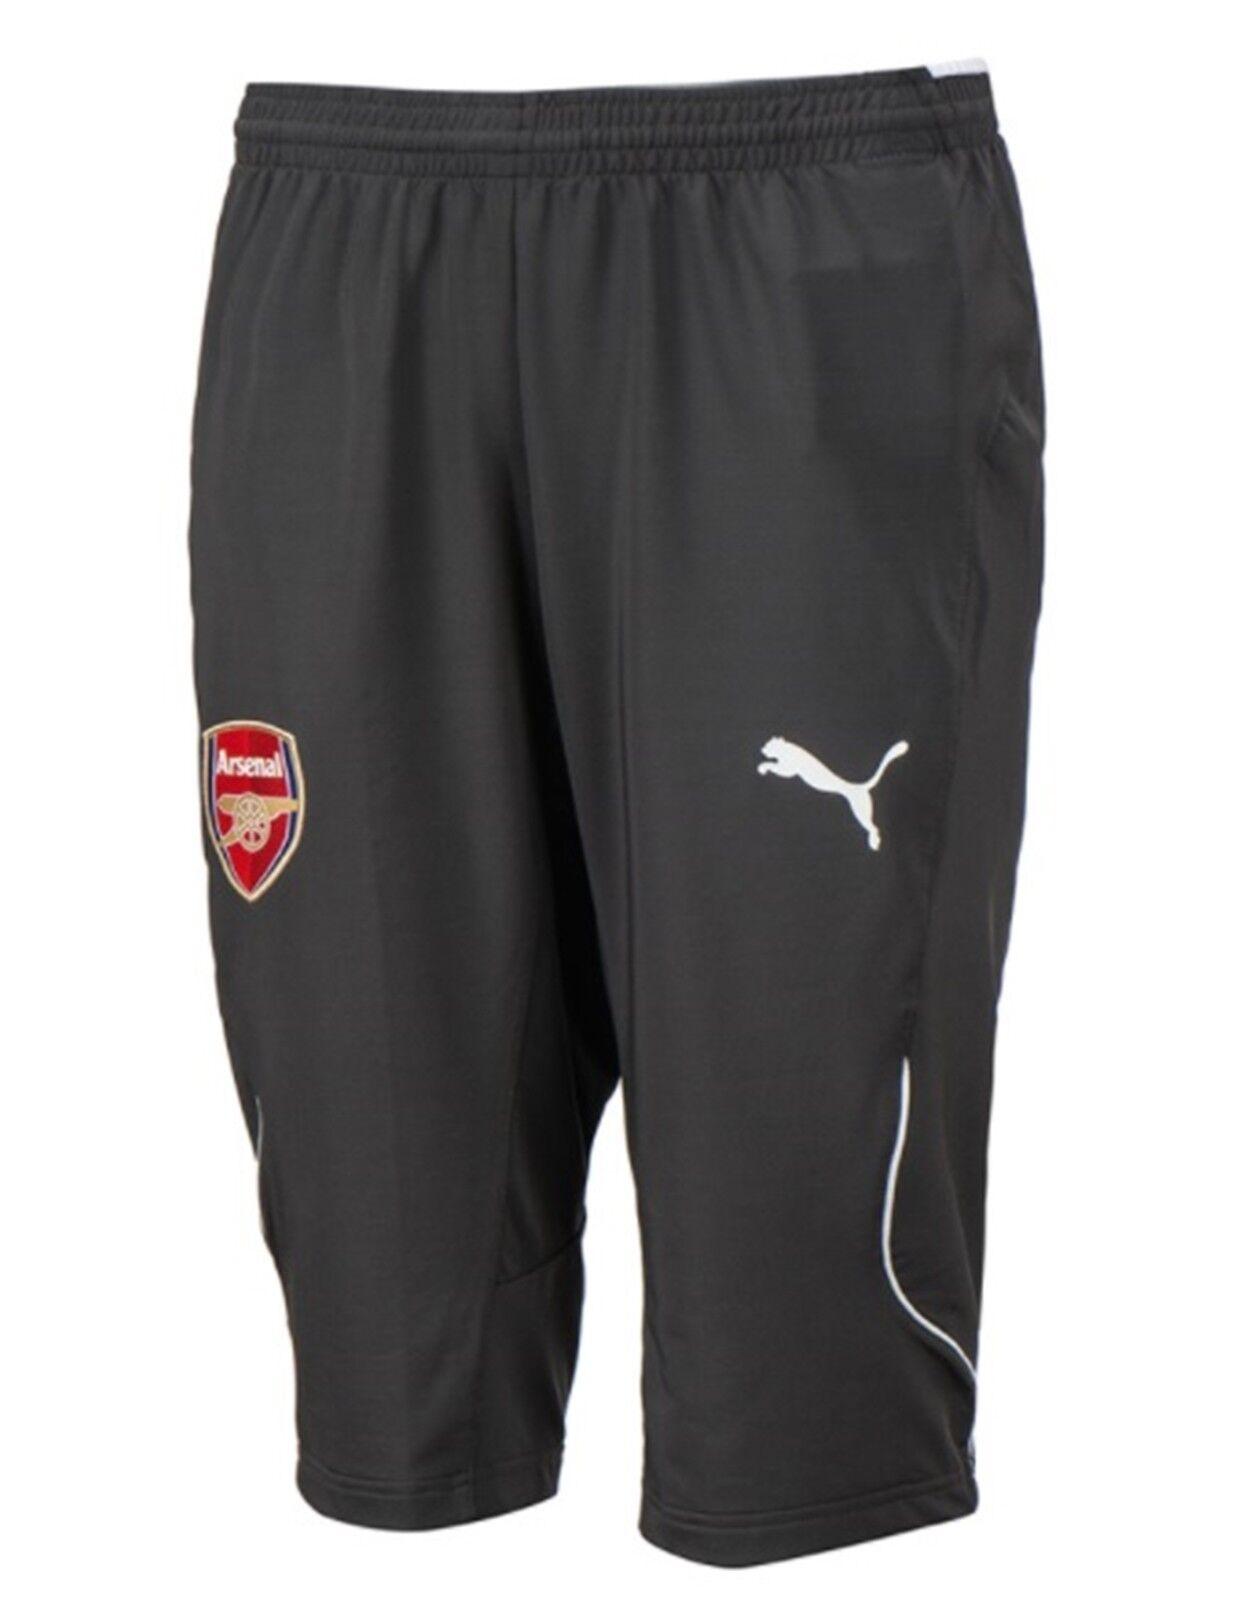 Puma Men Arsenal 3/4 Shorts Pants Training grau Athletic Soccer Pant 751707-01